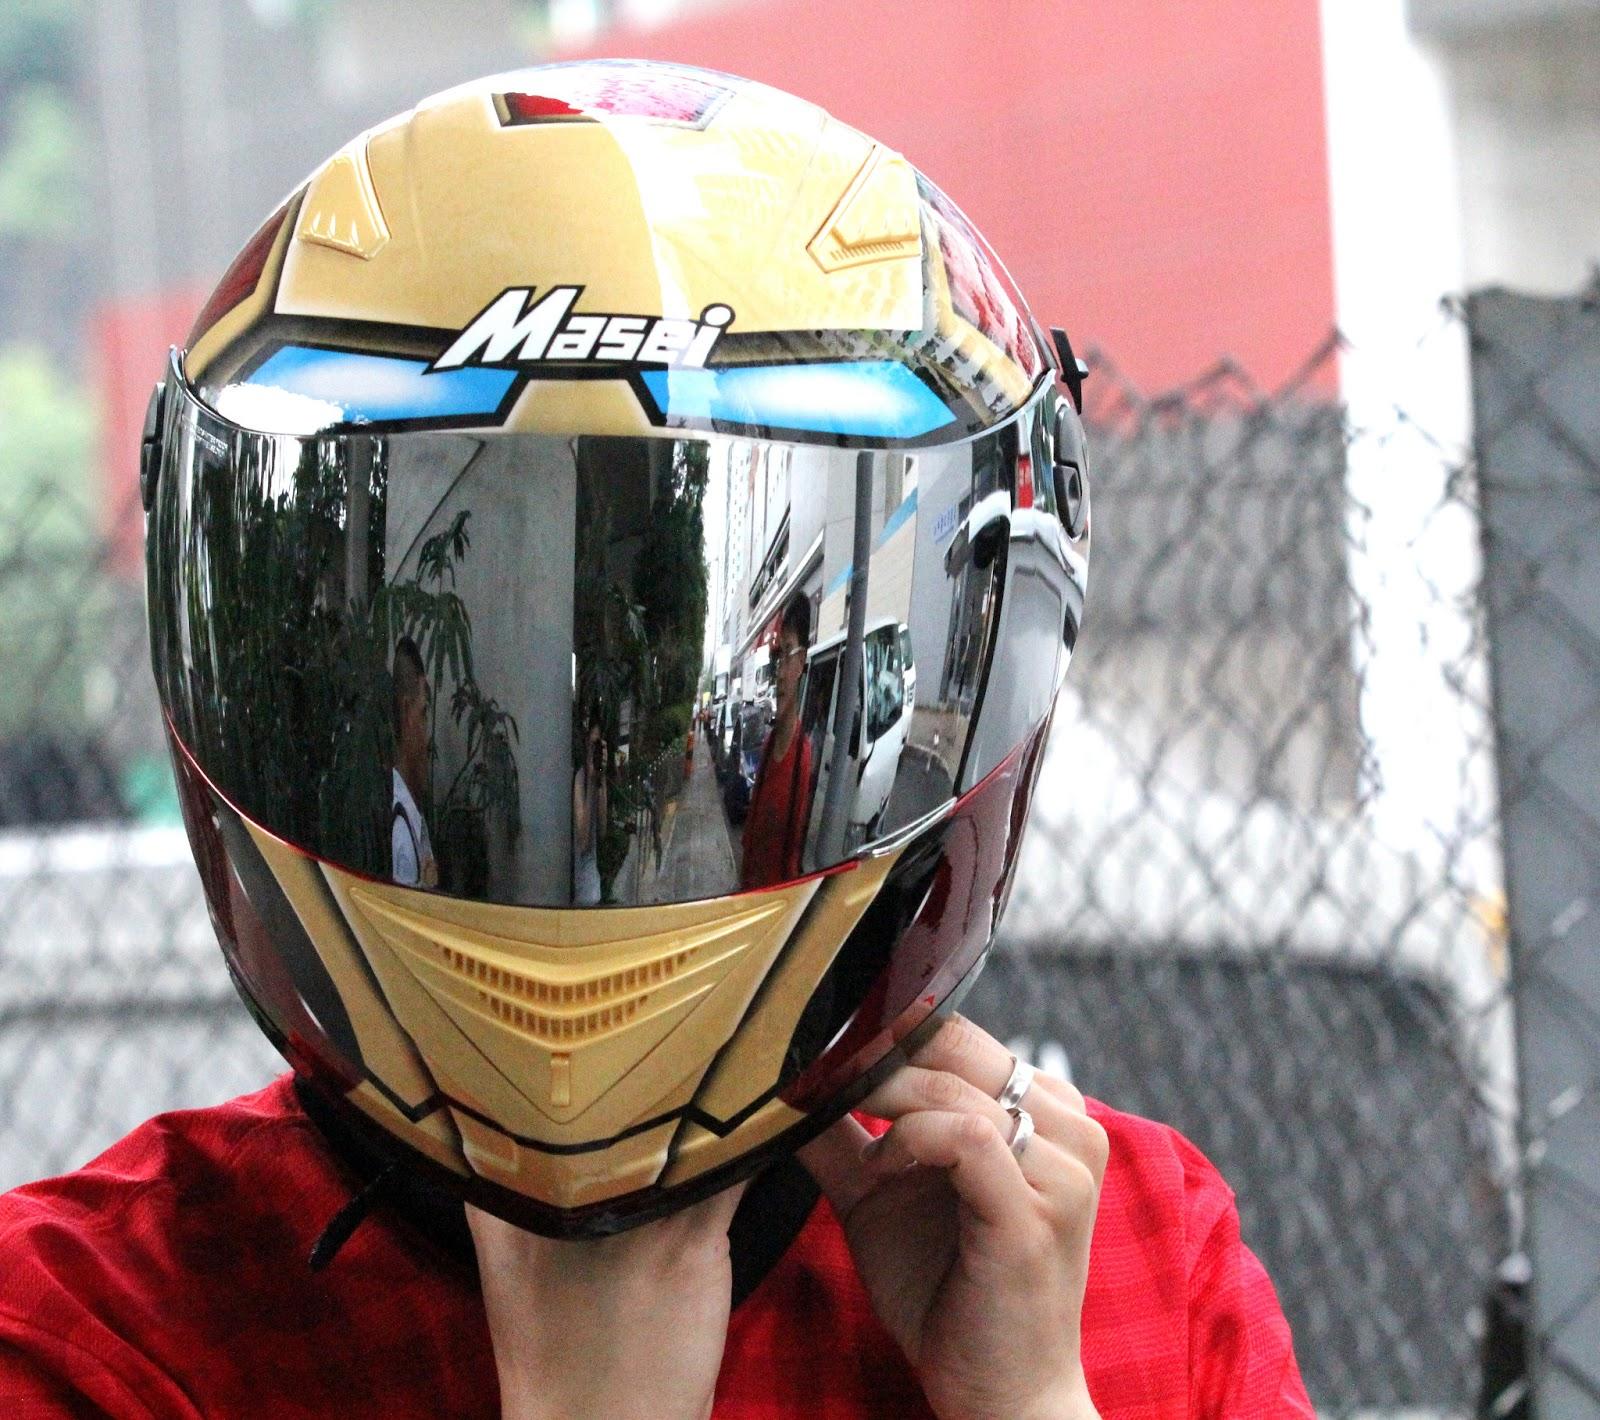 Luusama Motorcycle And Helmet Blog News: New Release of